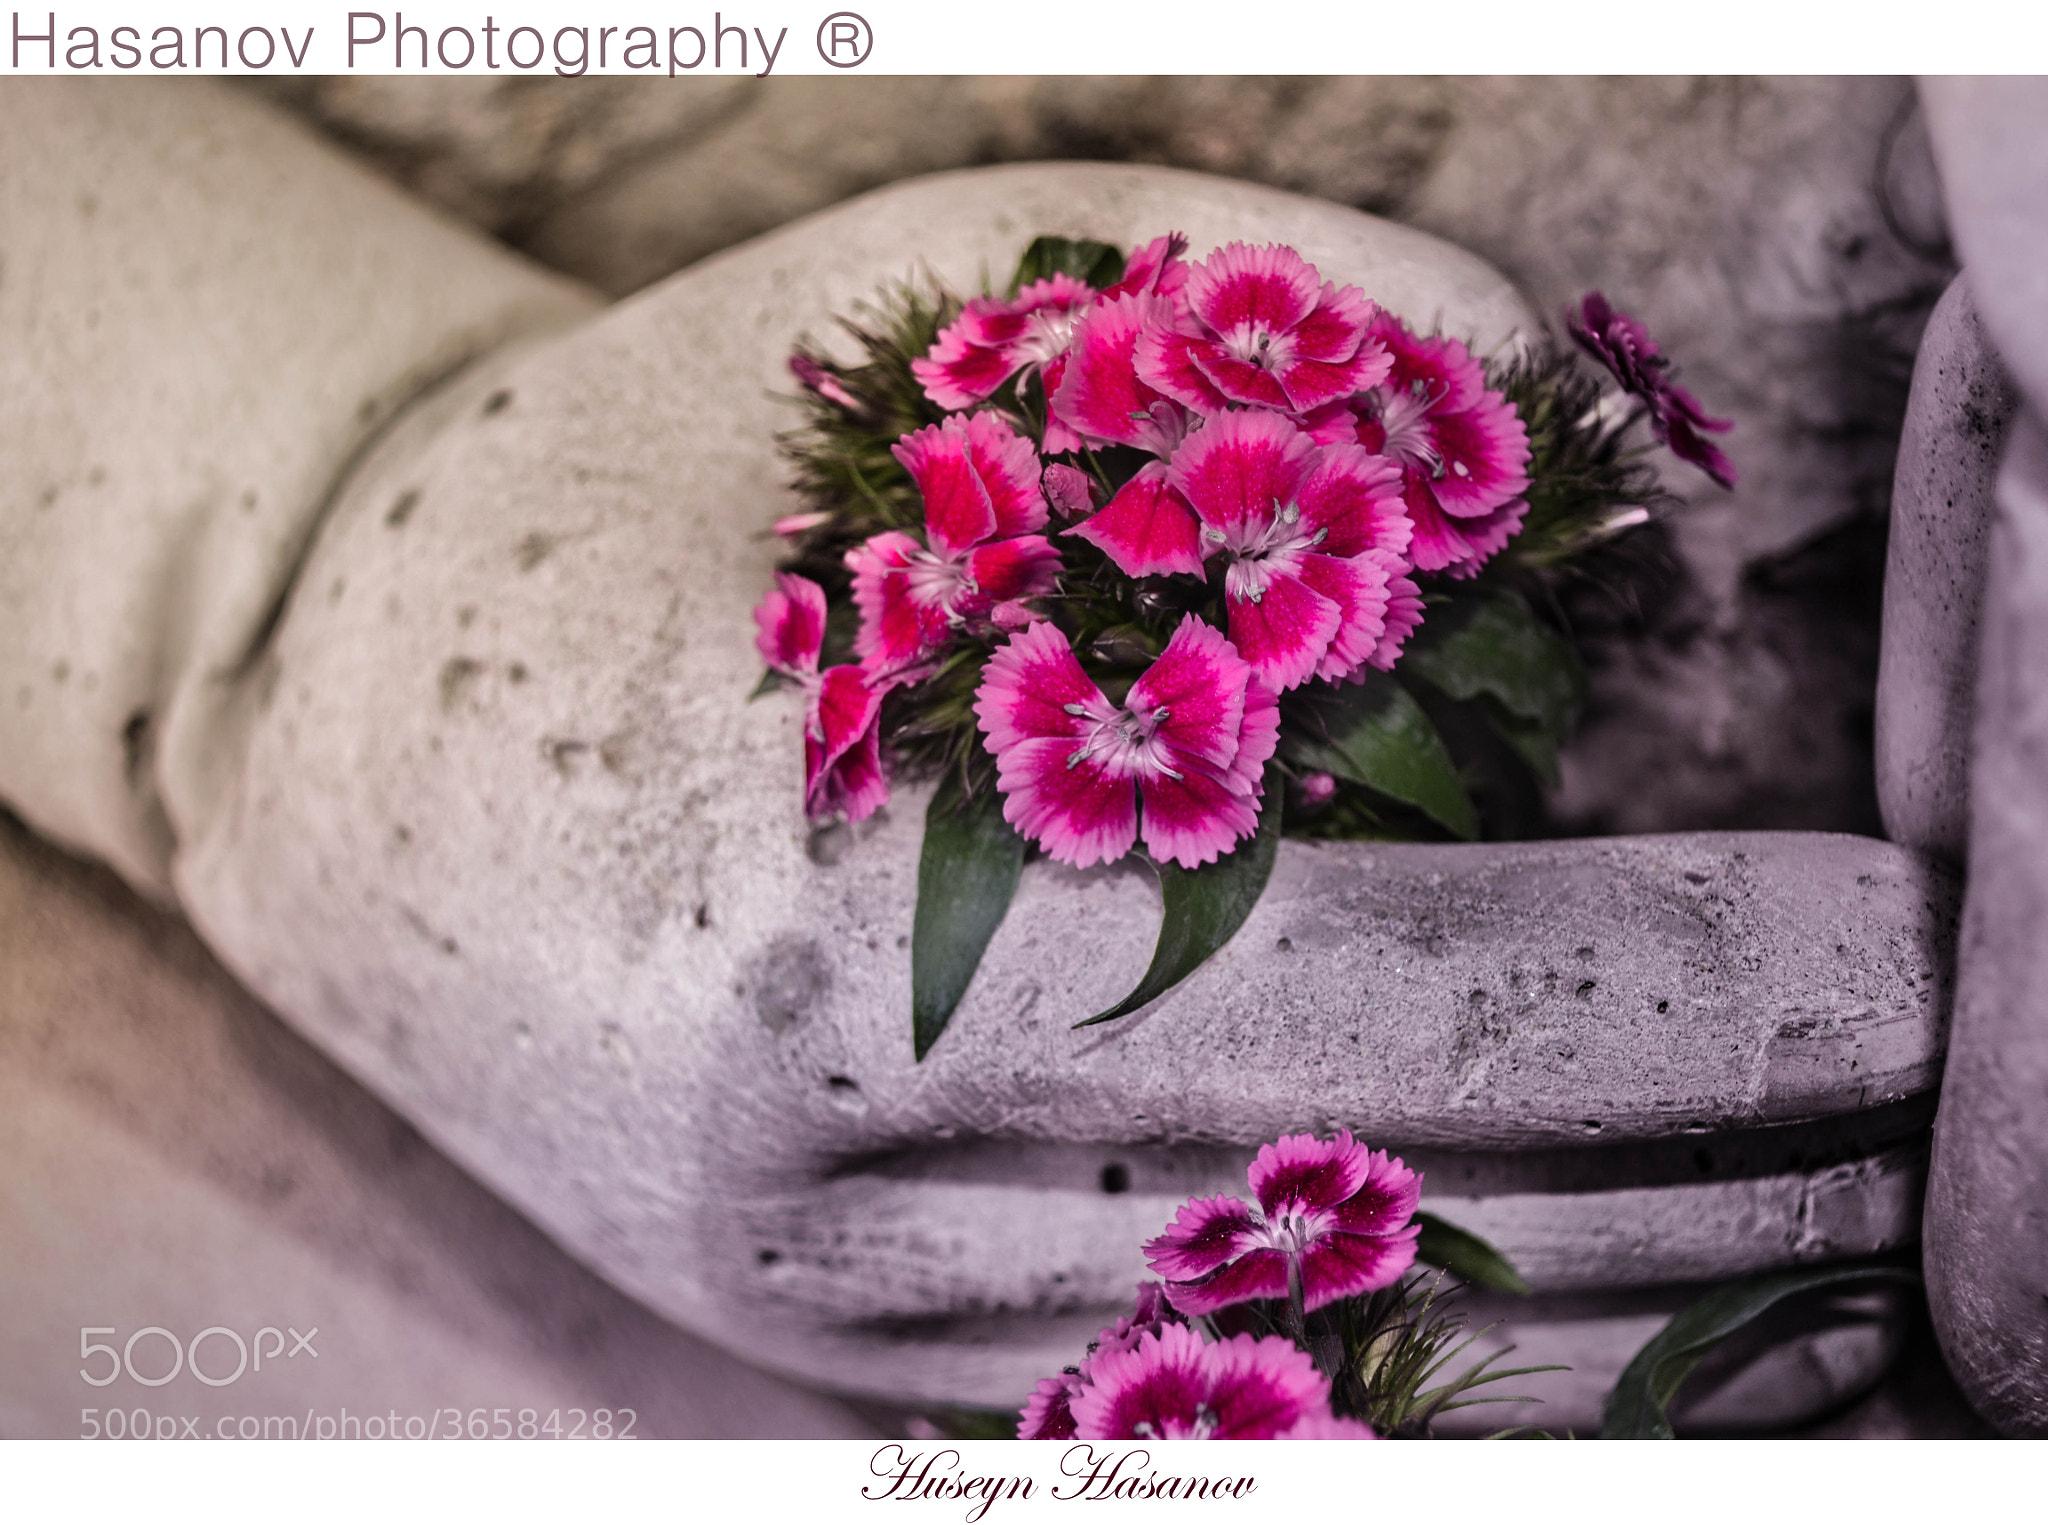 Photograph Untitled by Huseyn Hasanov on 500px